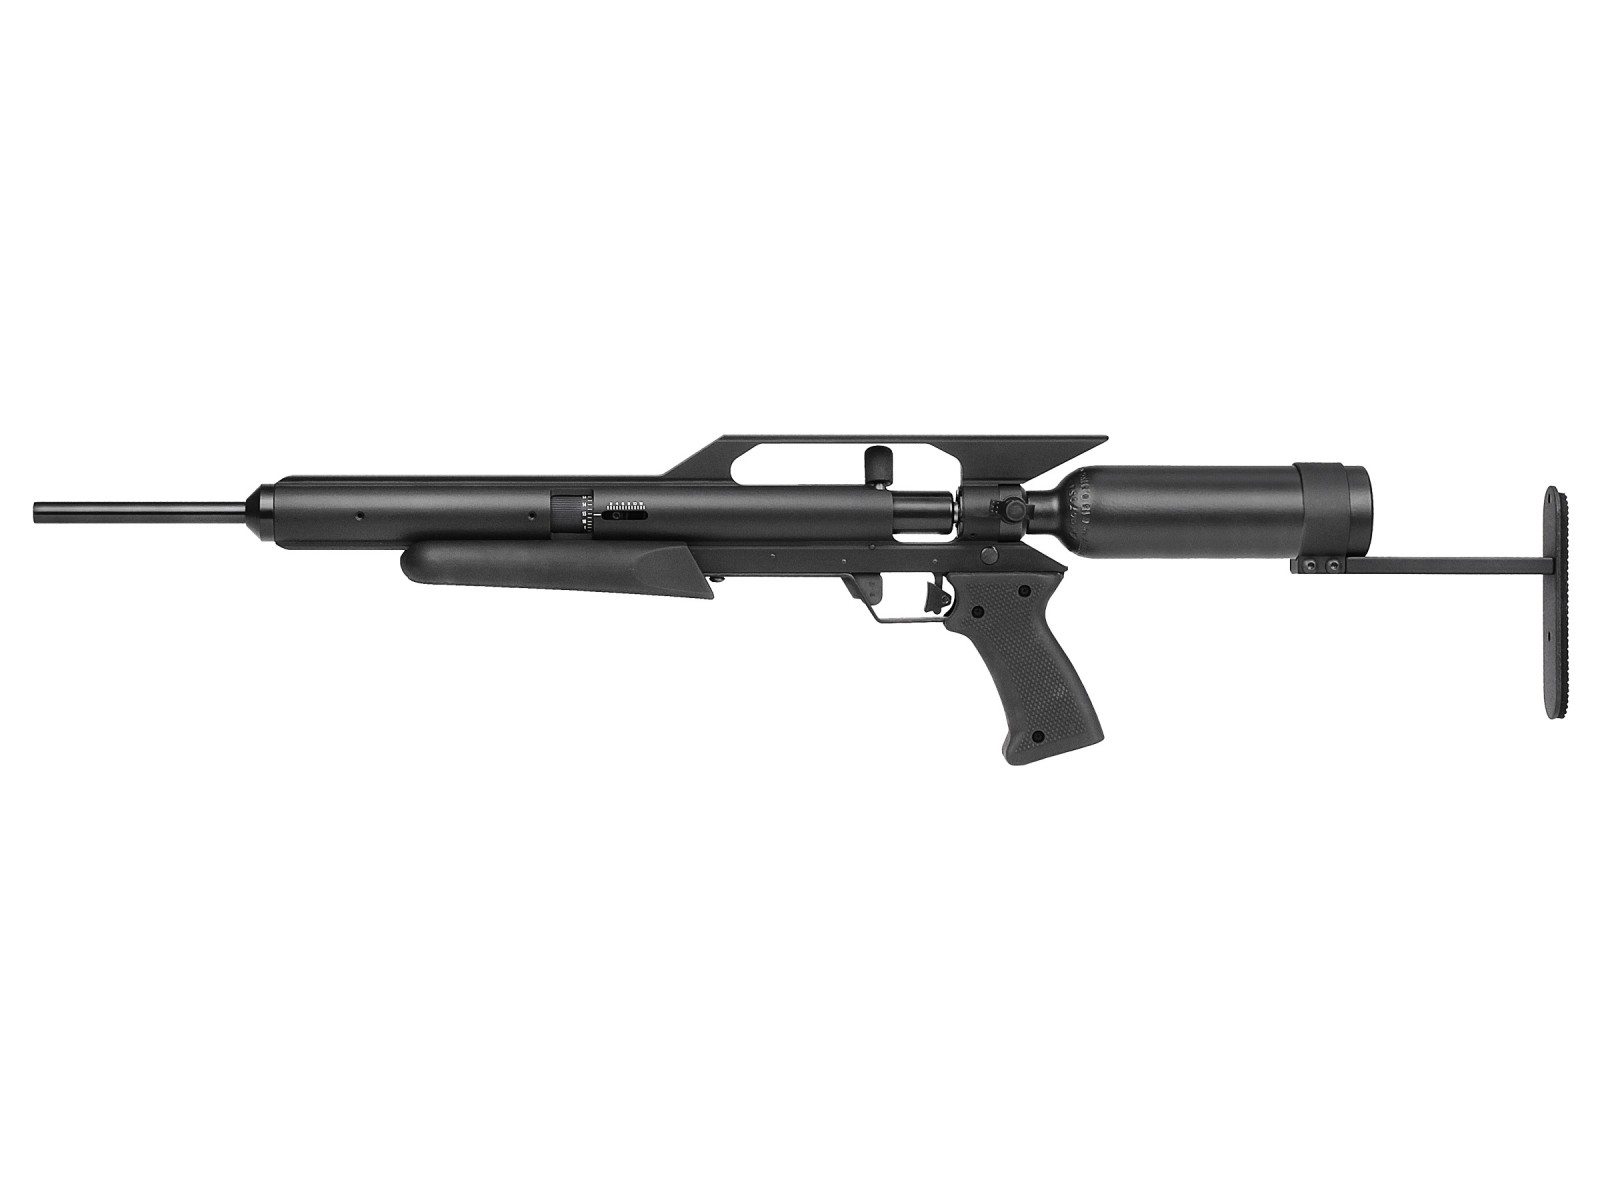 AirForce EscapeUL Air Rifle, Spin-Loc Tank